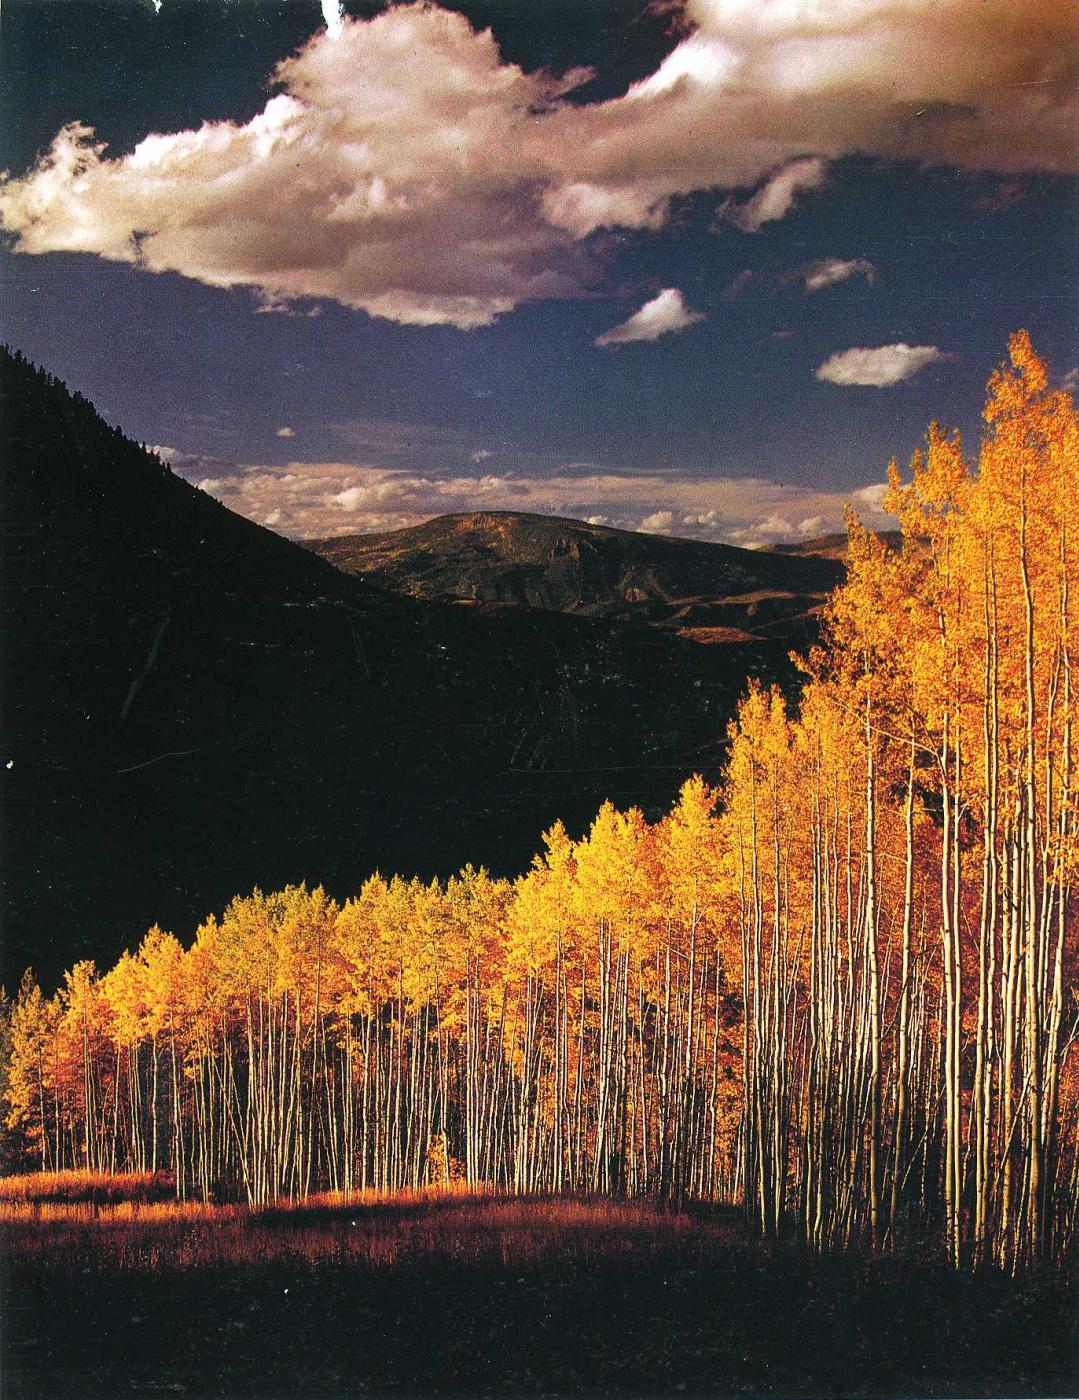 David Munich. Golden autumn